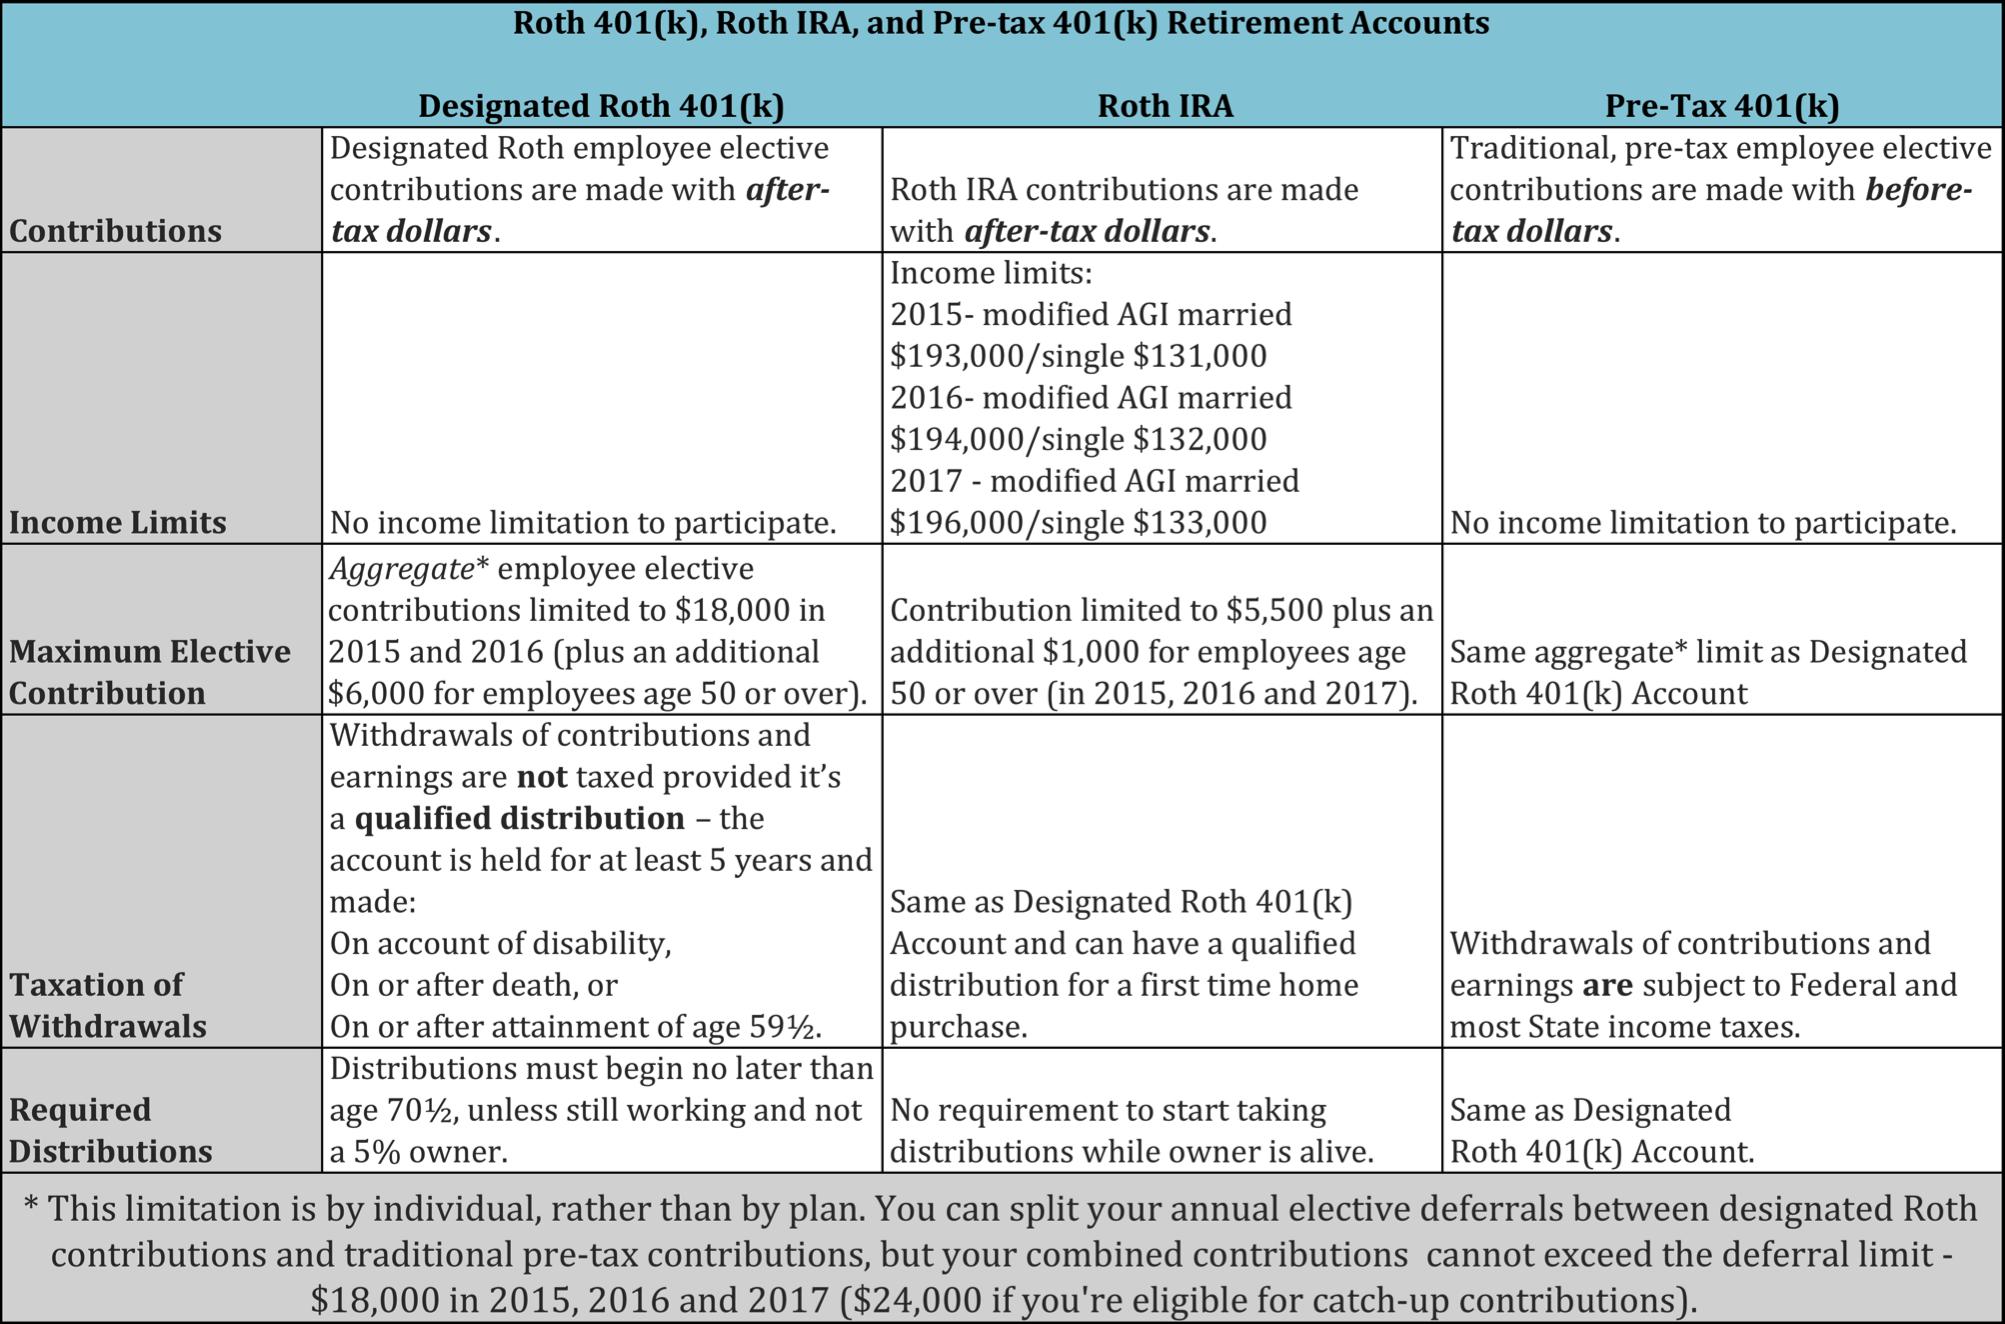 SOURCE:https://www.irs.gov/retirement-plans/roth-comparison-chart